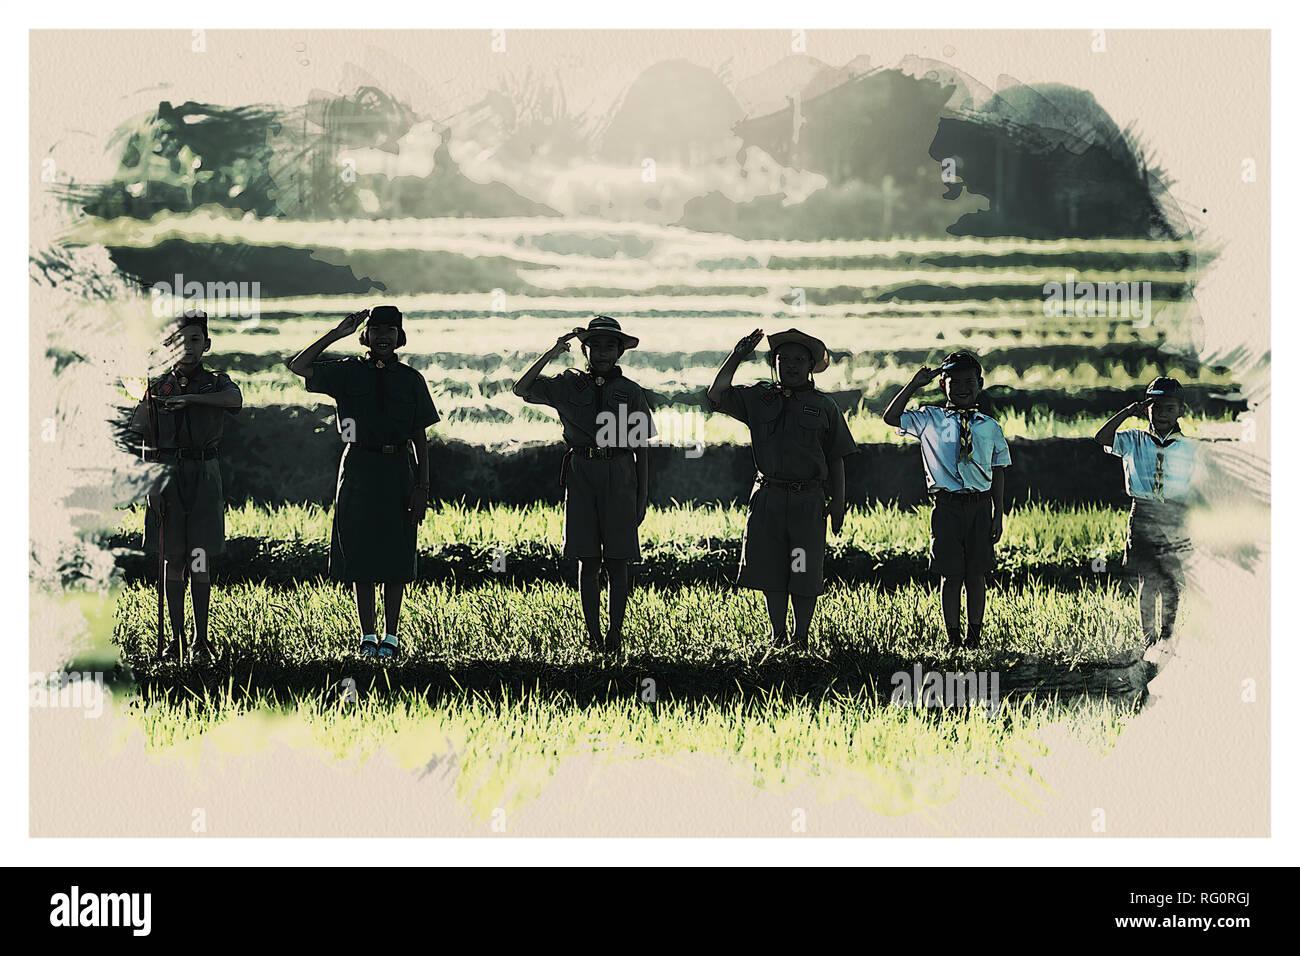 Scout boys of Tropics.jpg - RG0RGJ 1RG0RGJ - Stock Image